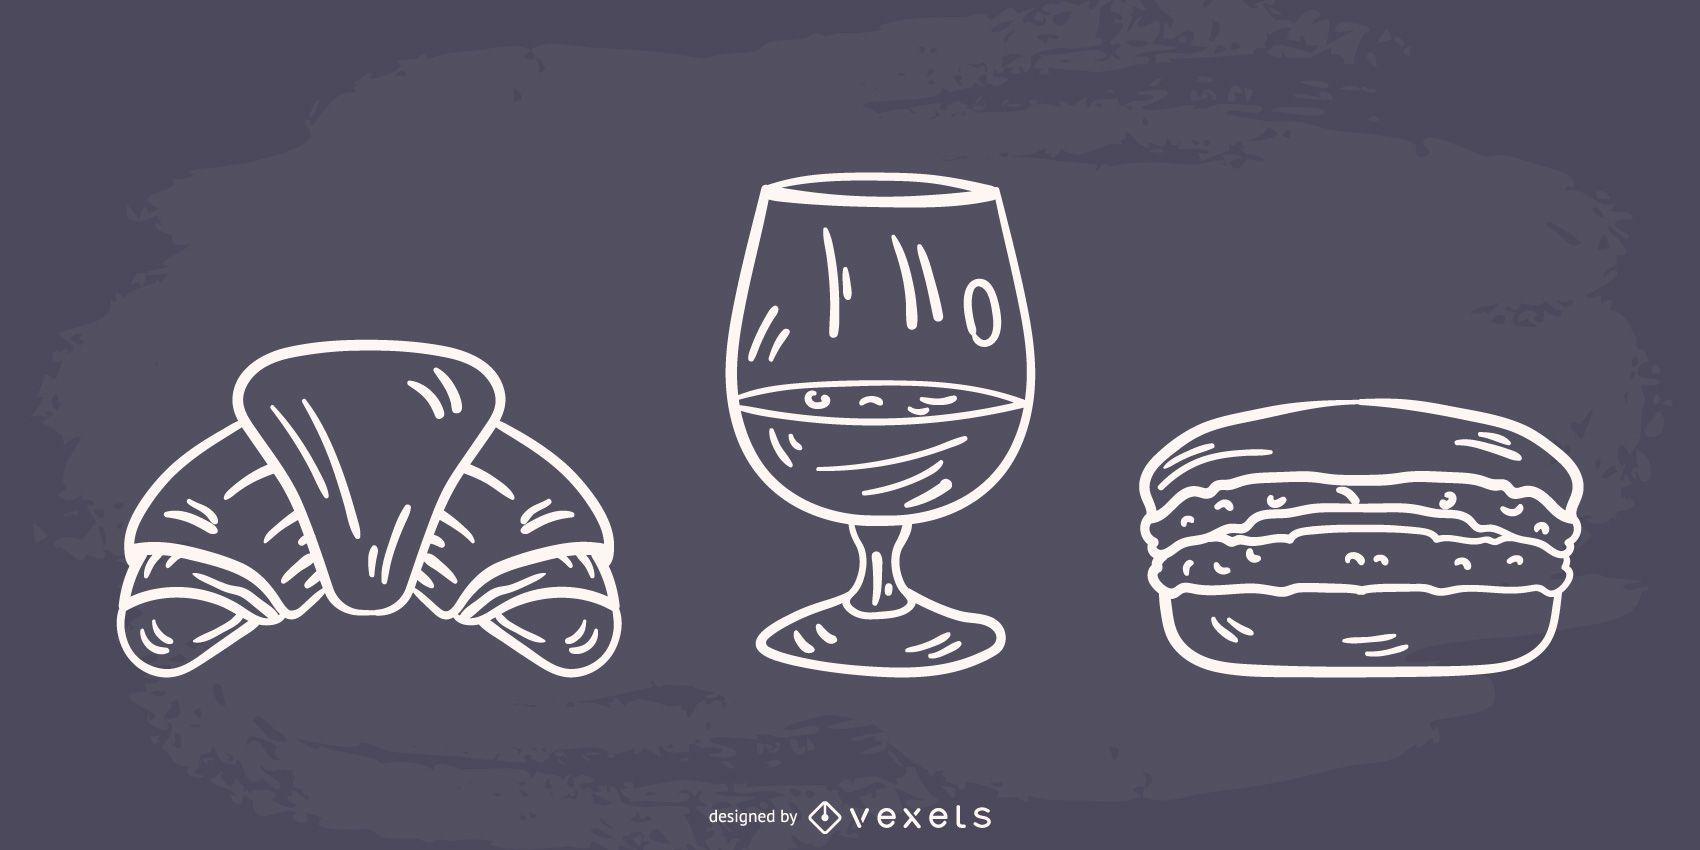 Diseño de comida francesa silueta